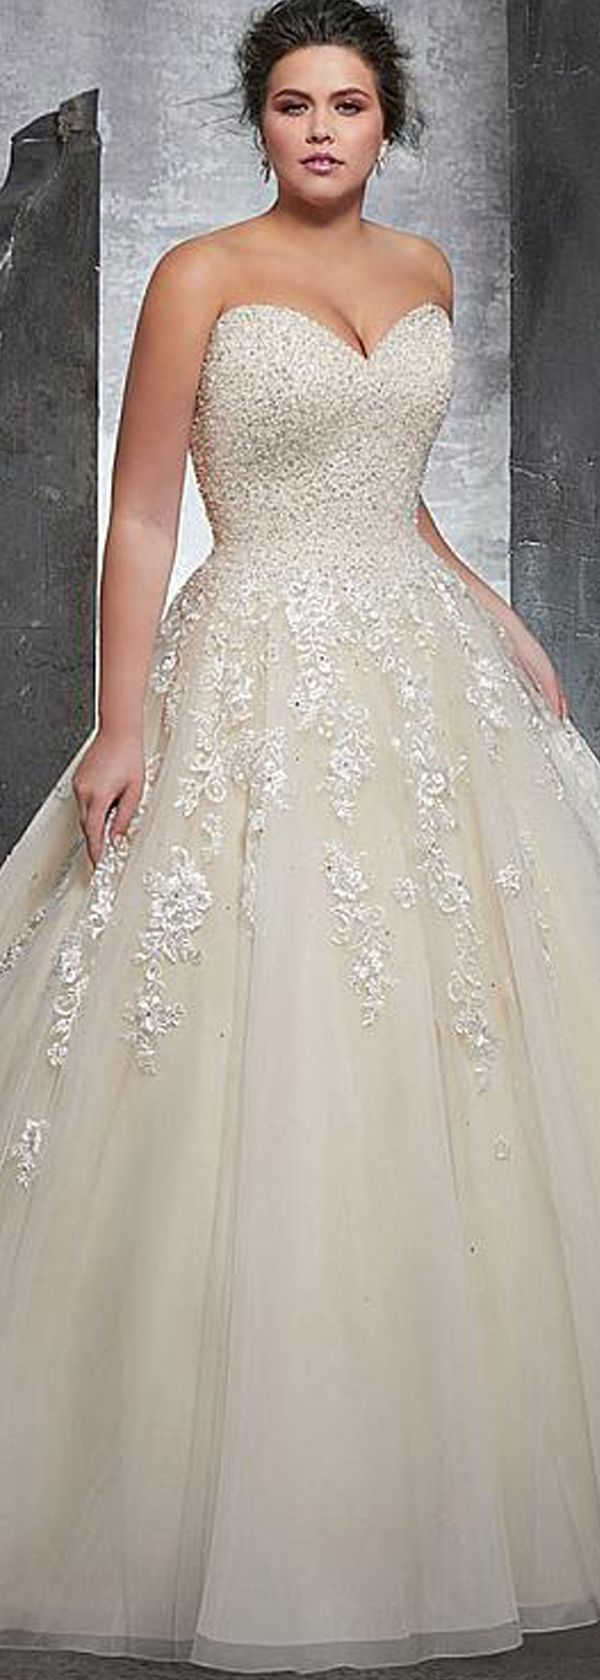 Plus size casual wedding dress   best Curvy Bridal Dresses images on Pinterest  Short wedding